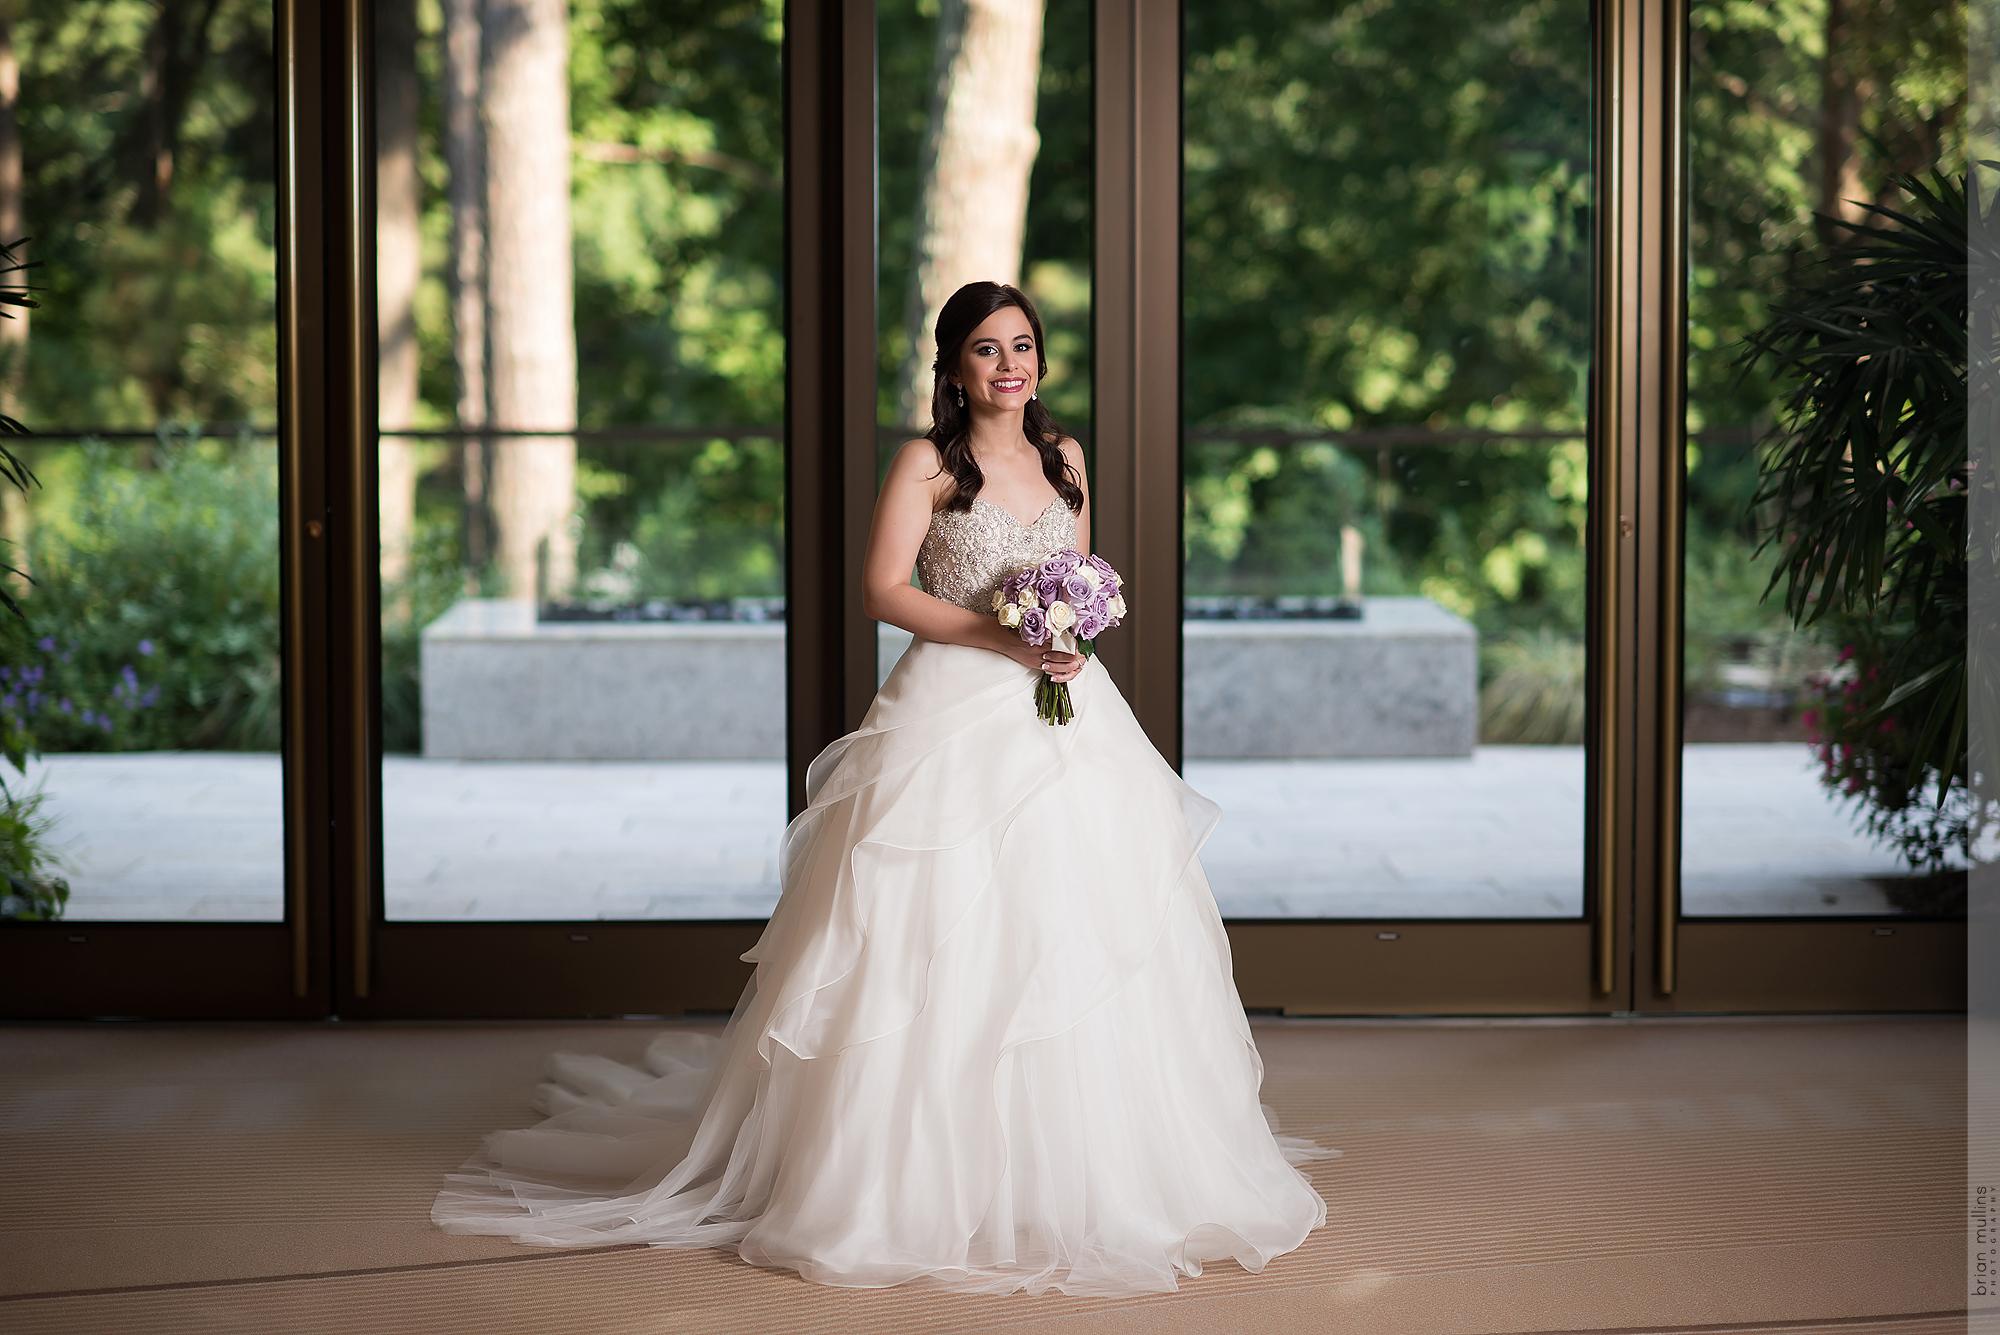 Umstead Hotel Bridal Portrait | Sara